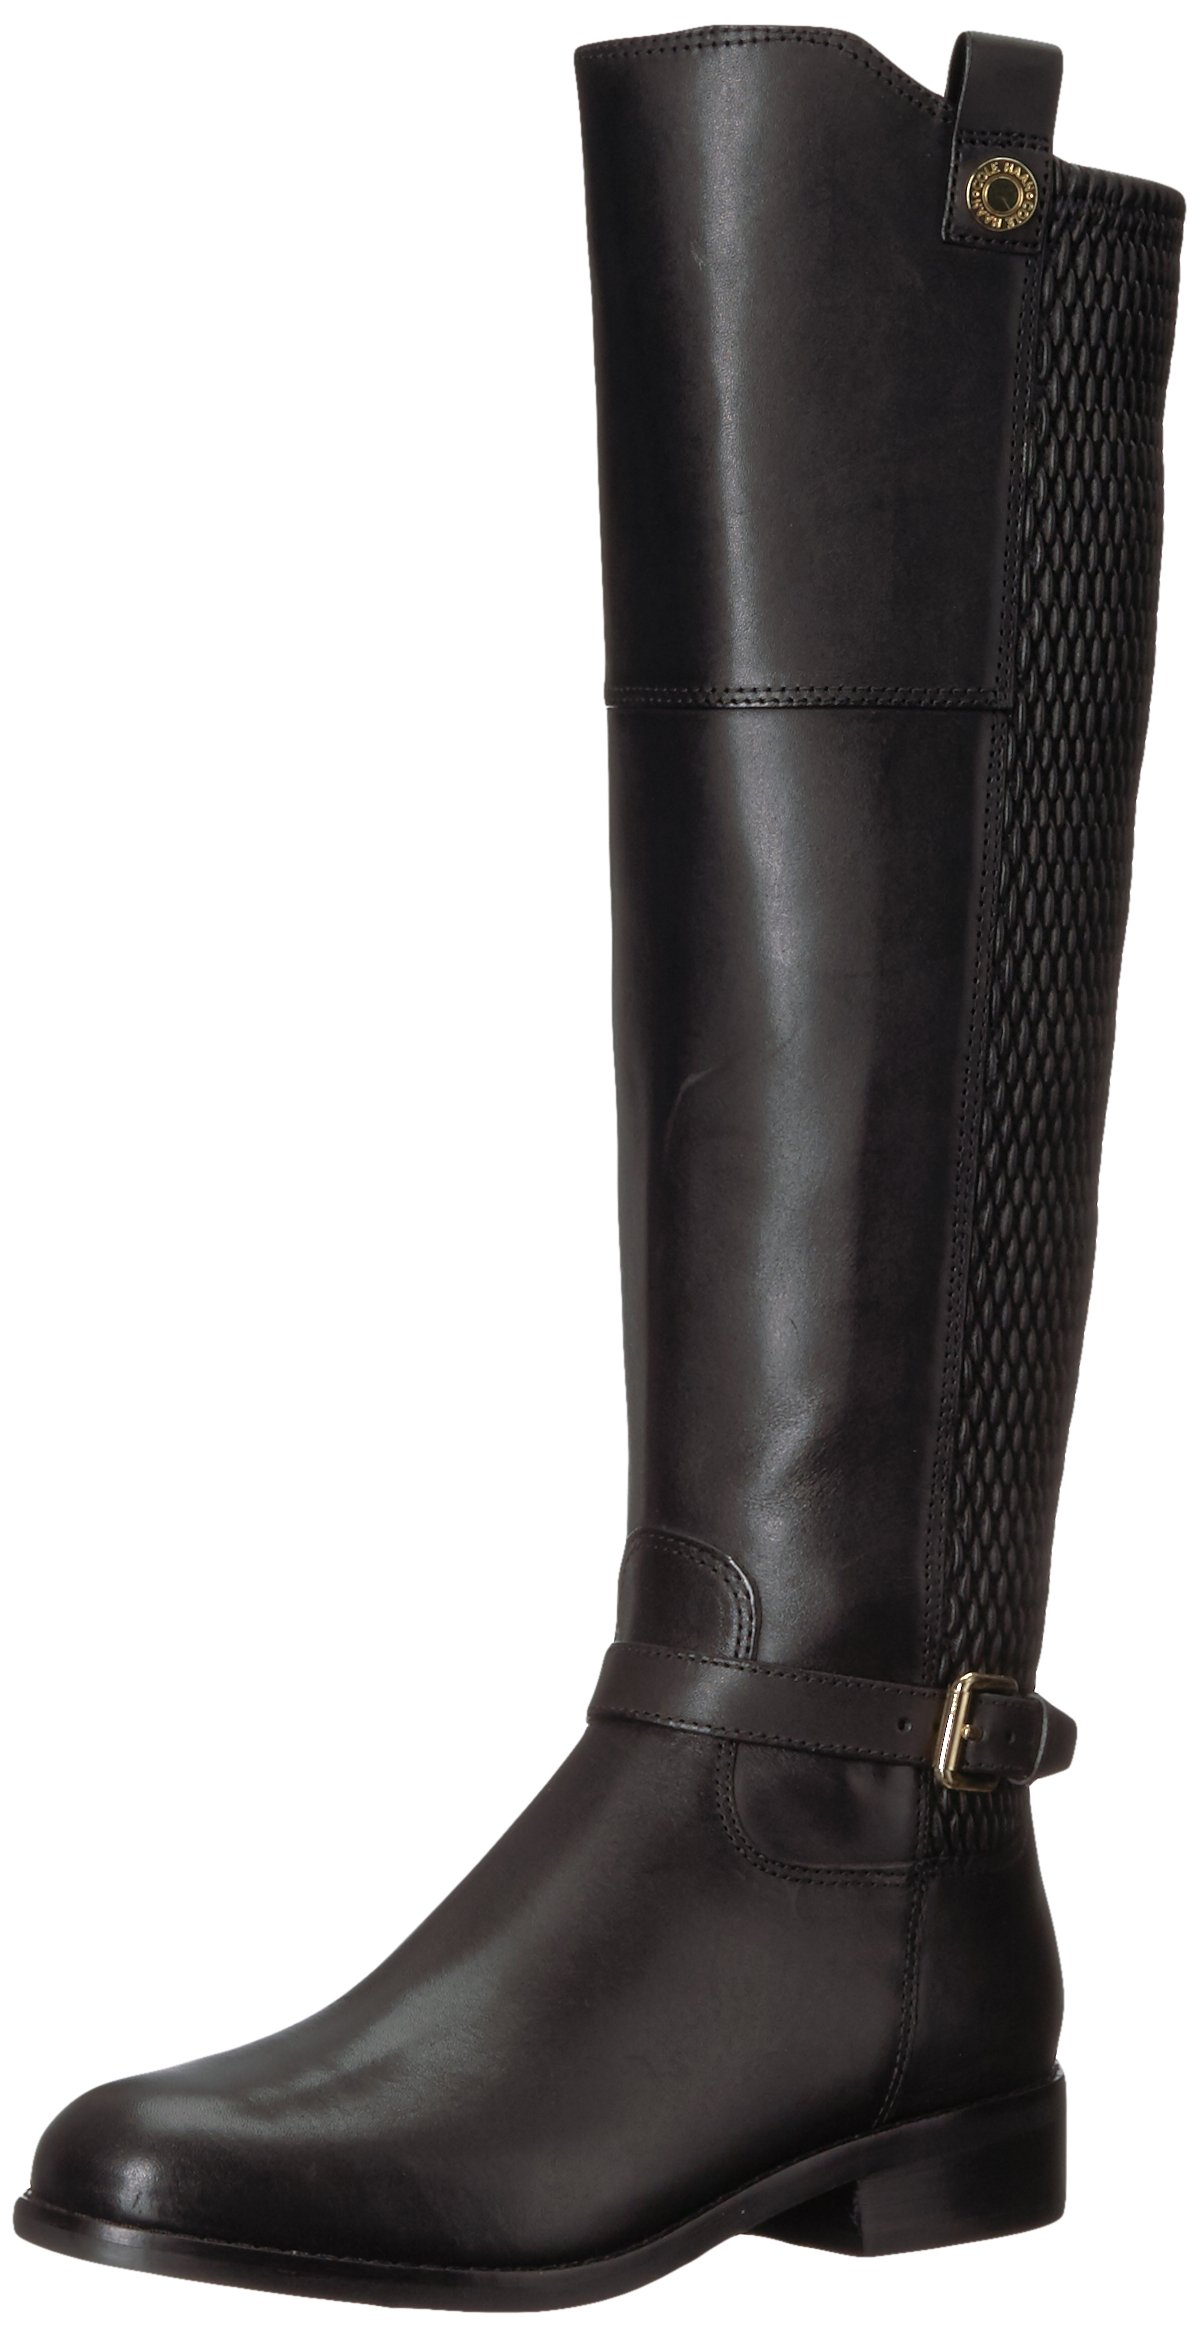 Cole Haan Women's Galina Boot, Black Leather, 8 B US